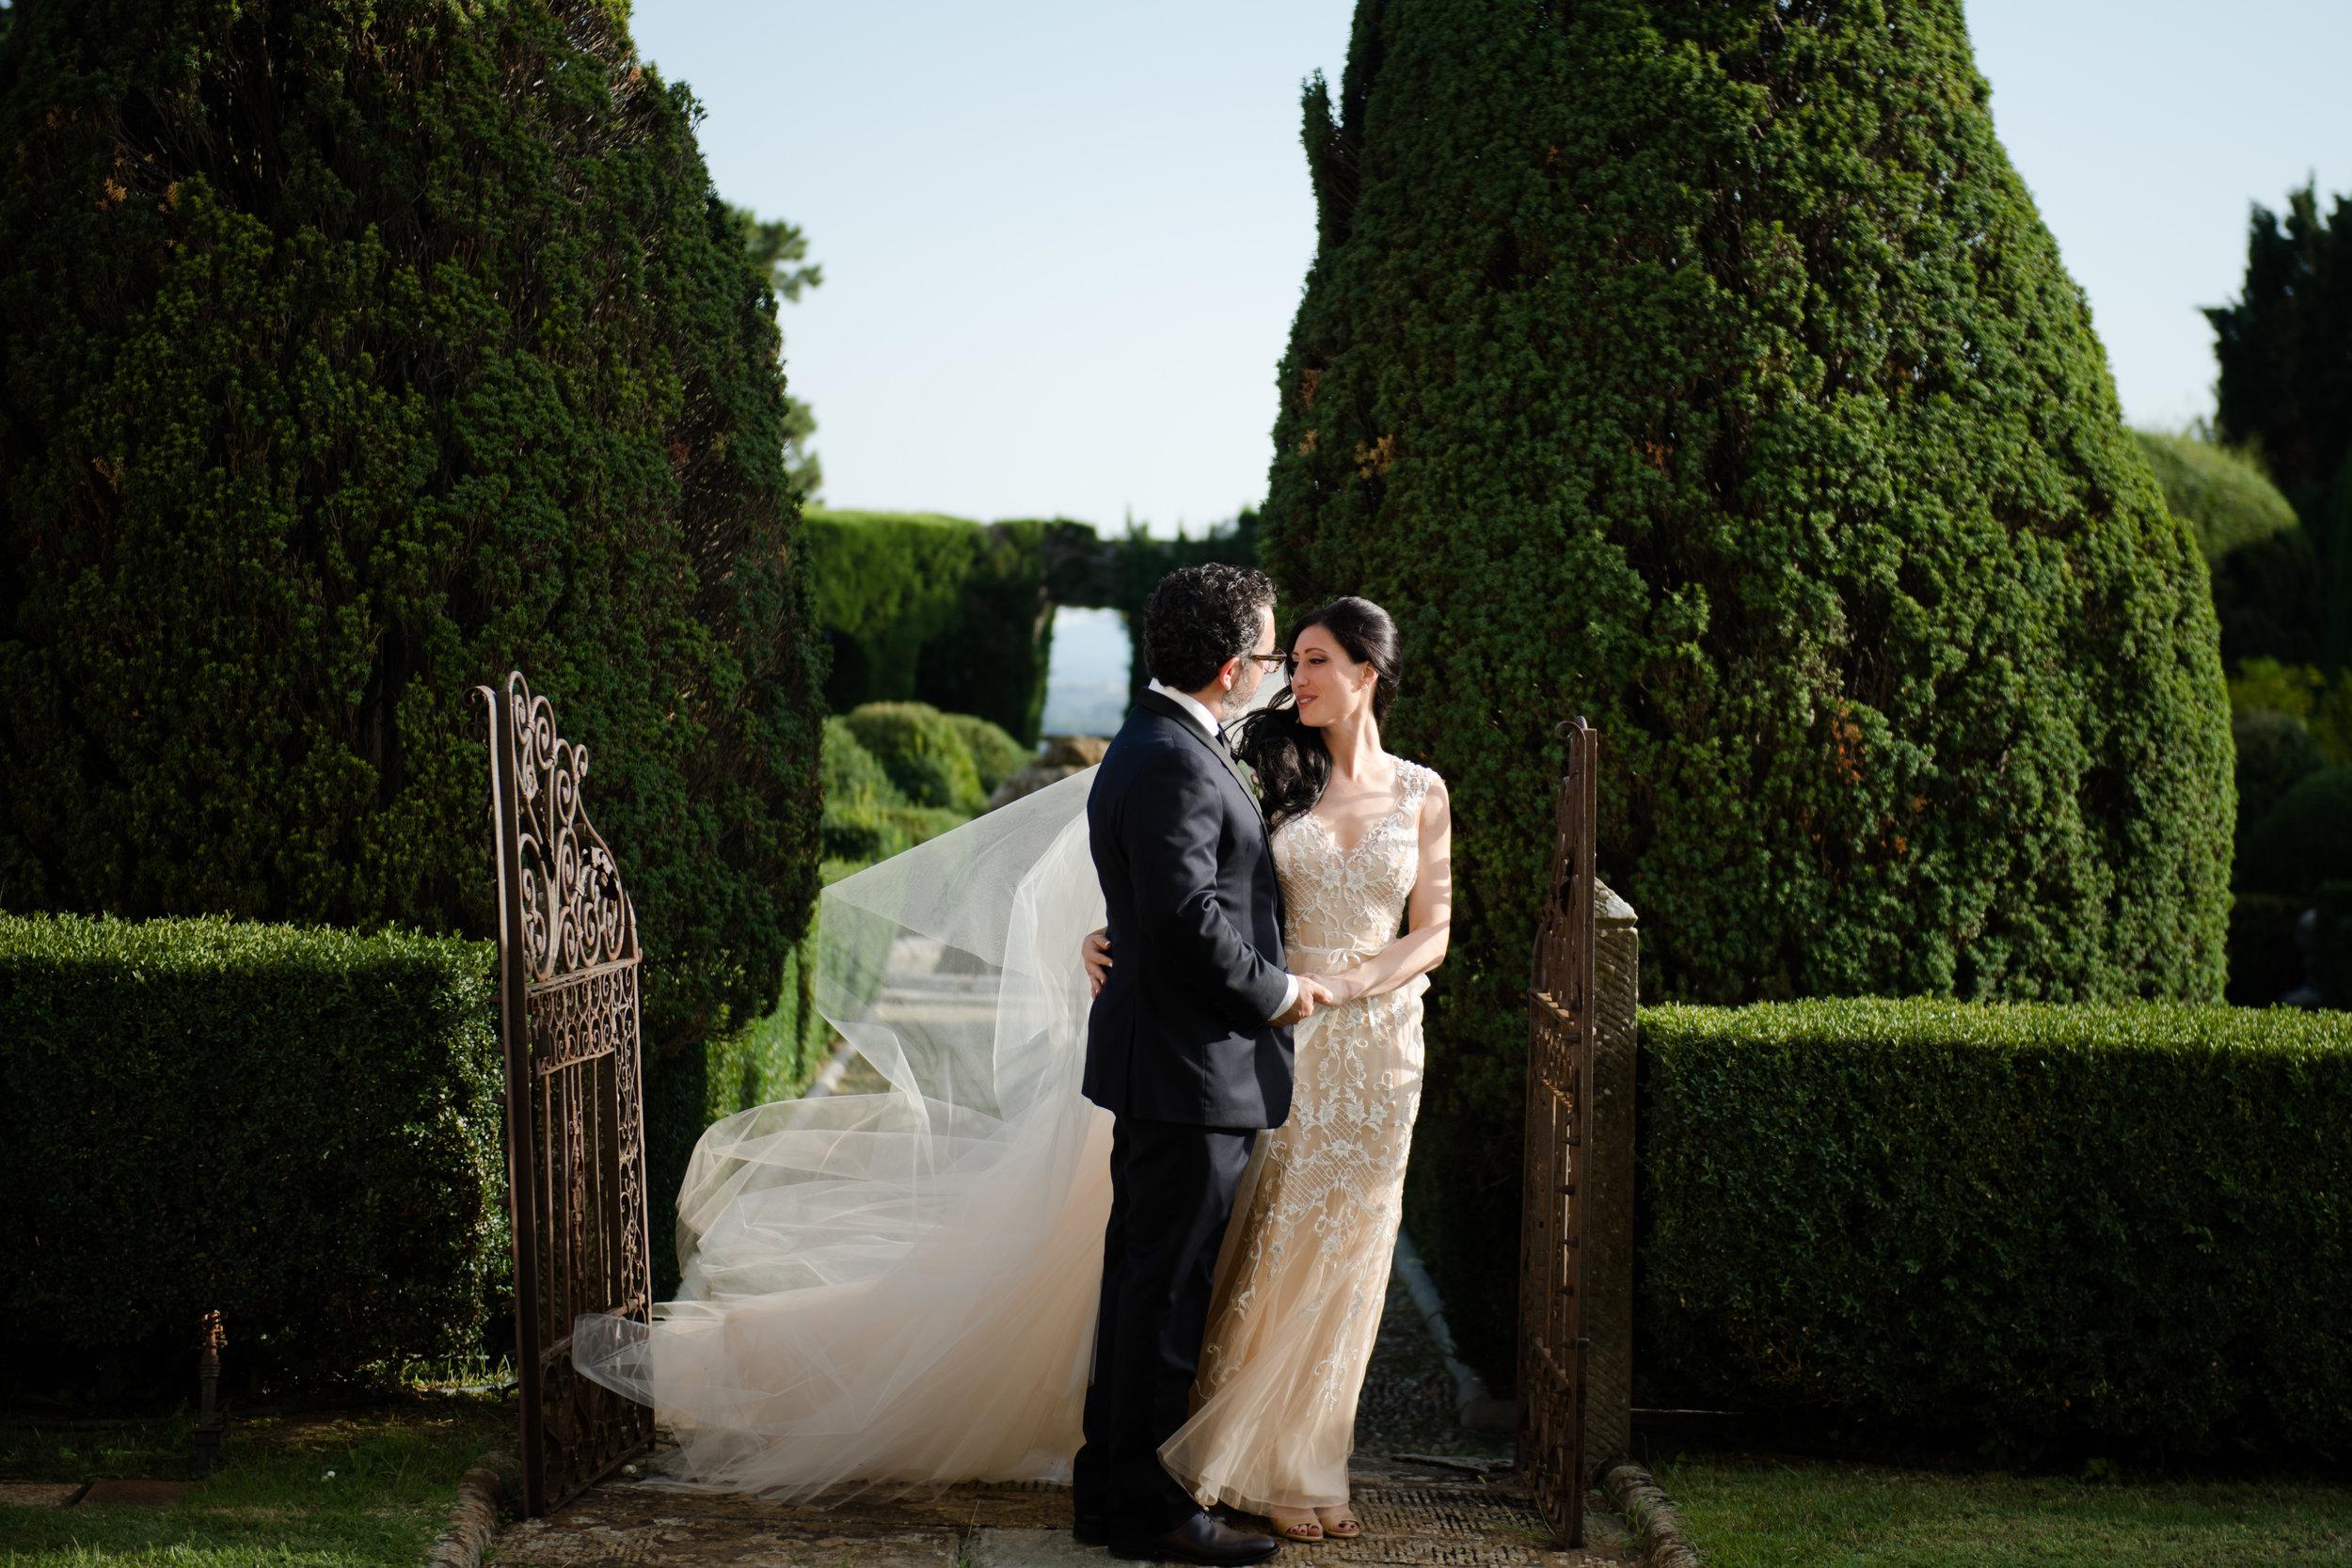 Morgan Manufacturing Wedding in Chicago, Illinois.